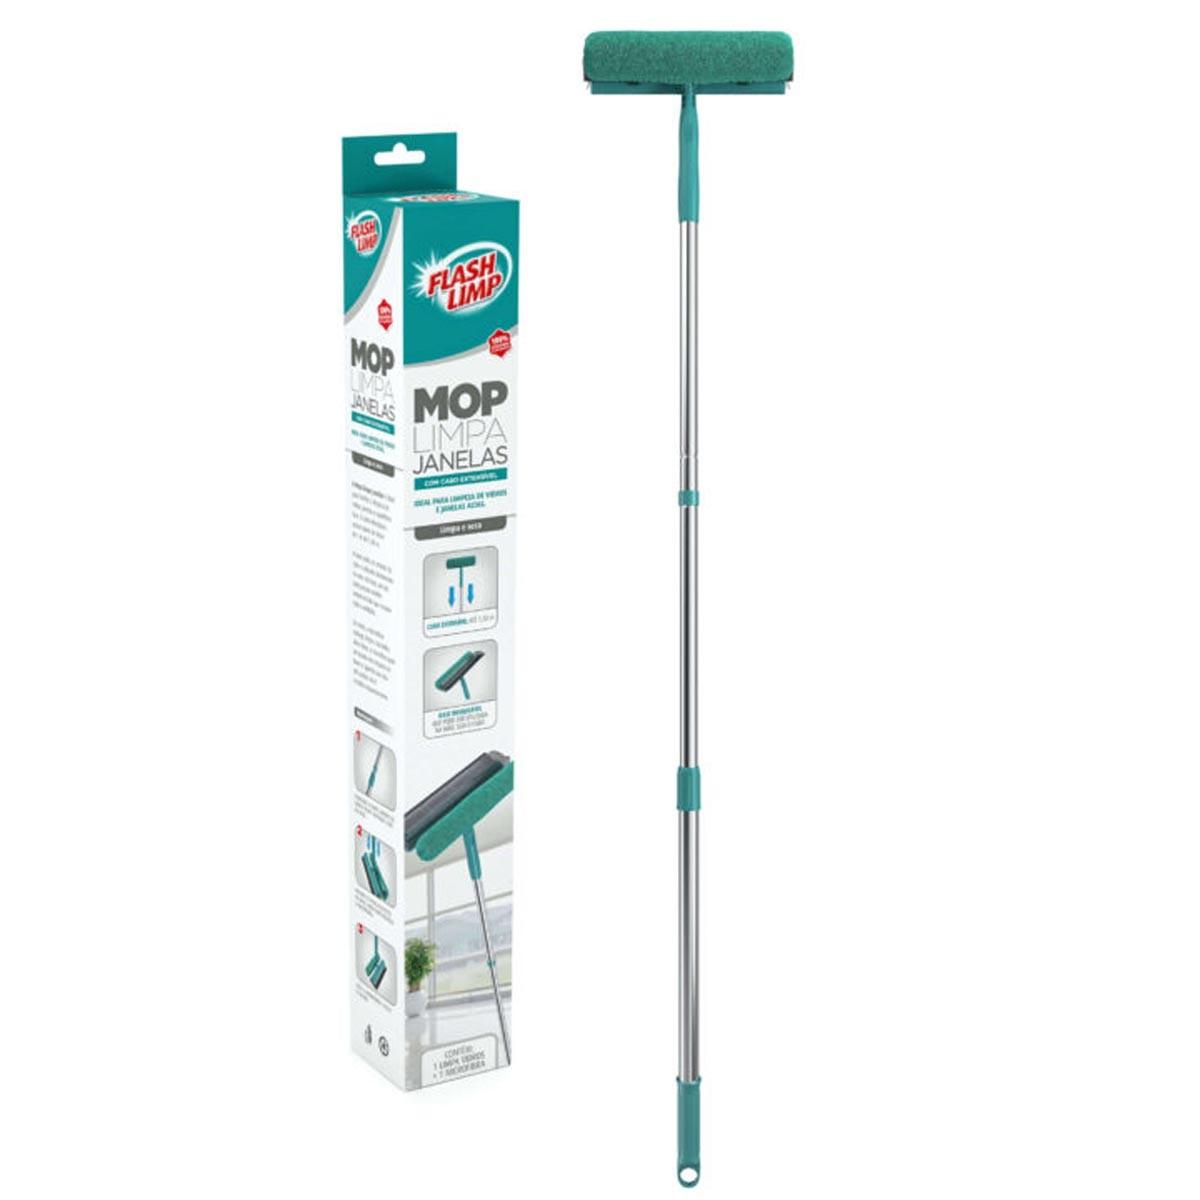 Mop Limpa Vidros Flash Limp 2 em 1 MOP6071